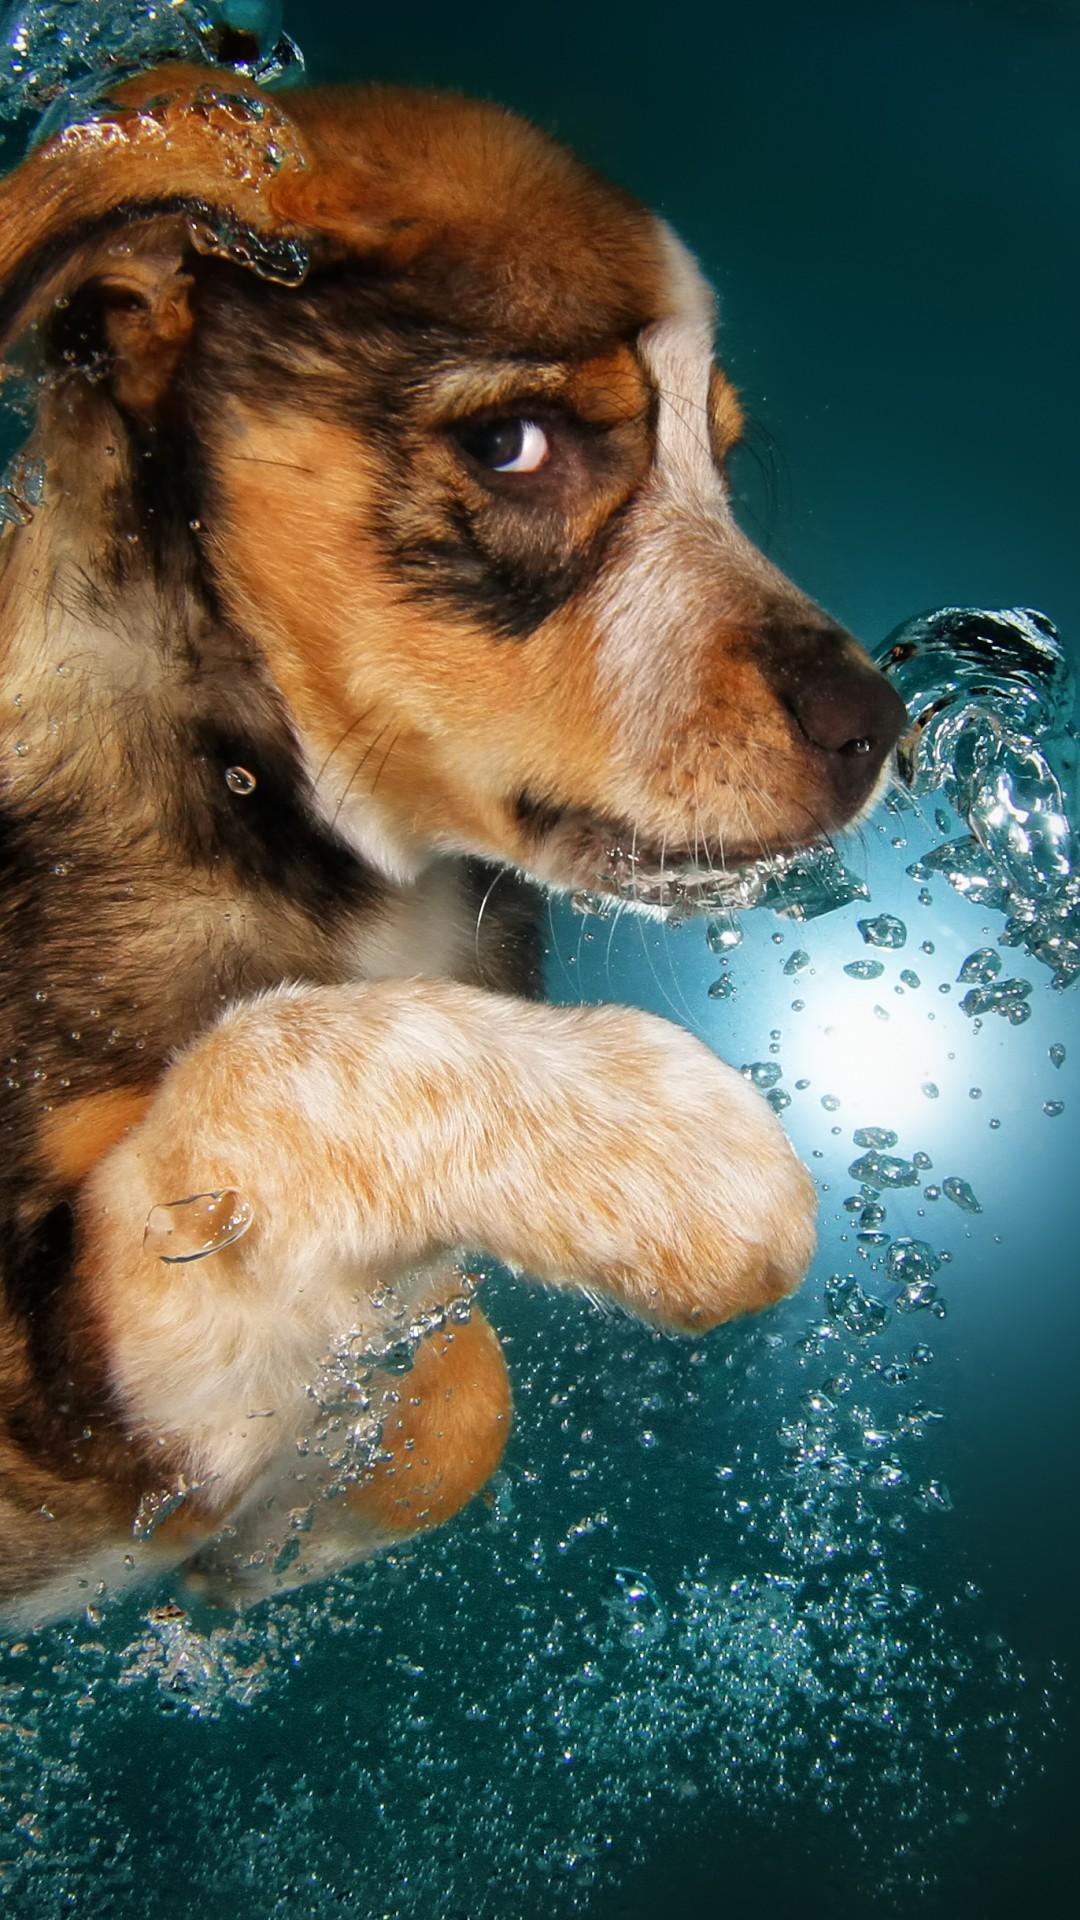 Cute Husky Wallpaper Hd Wallpaper Border Collie Dog Underwater Cute Animals